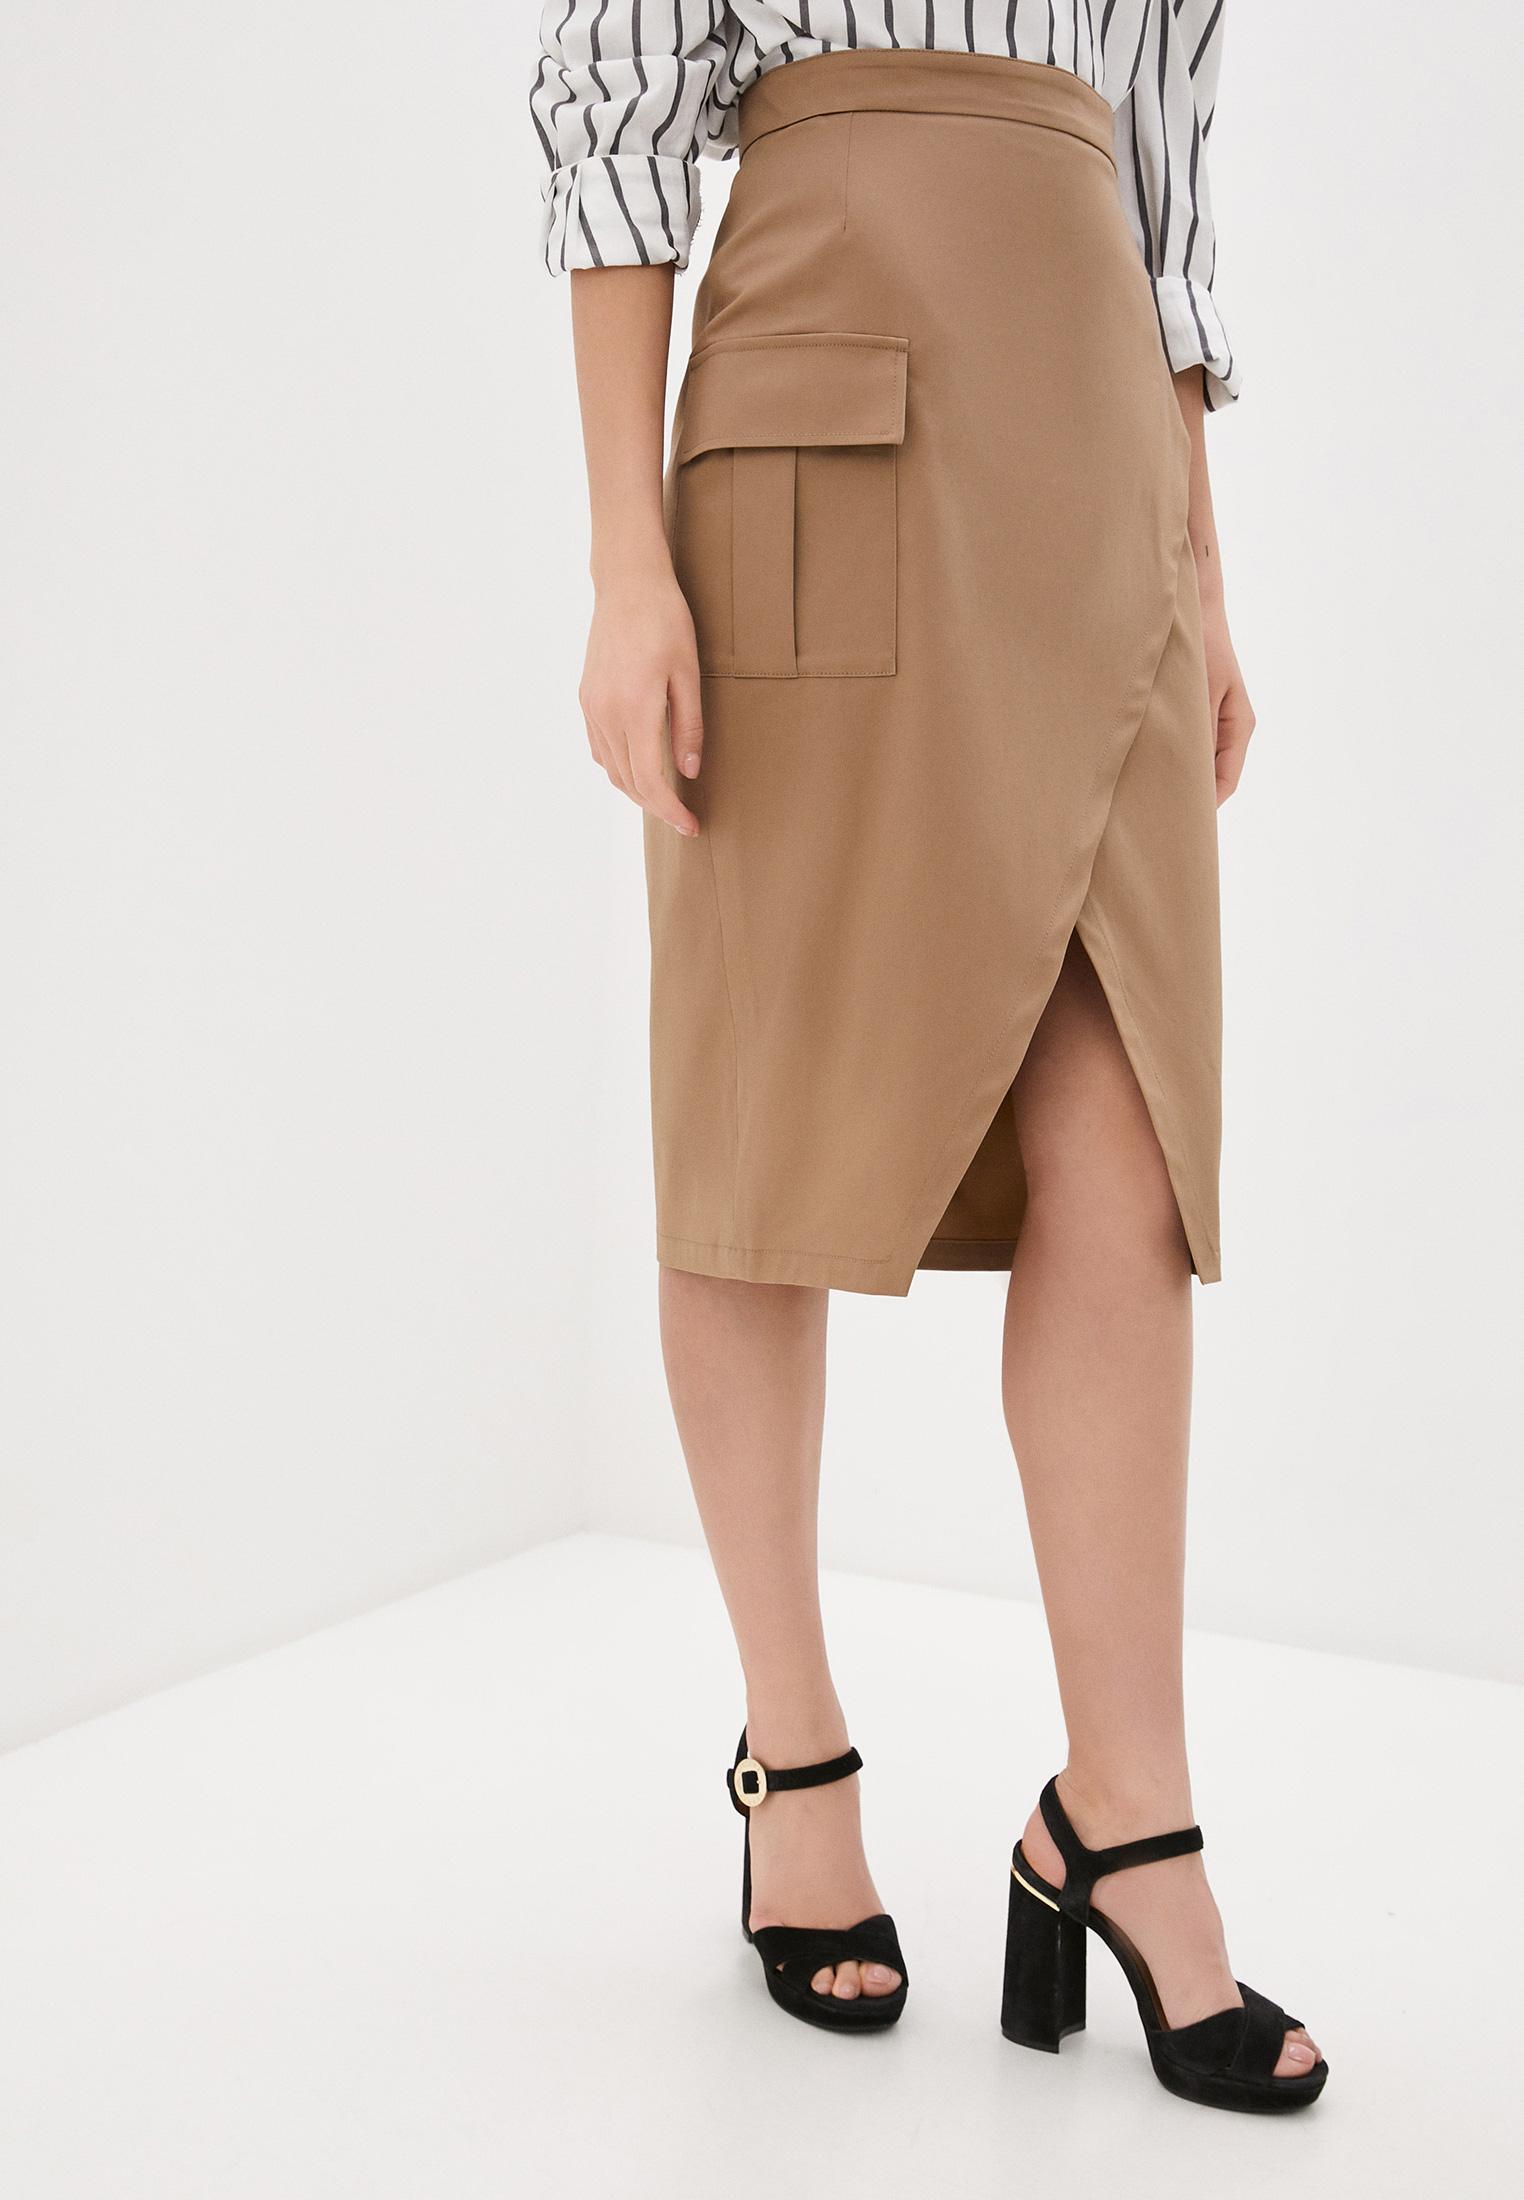 Узкая юбка L'Autre Chose OK540523022